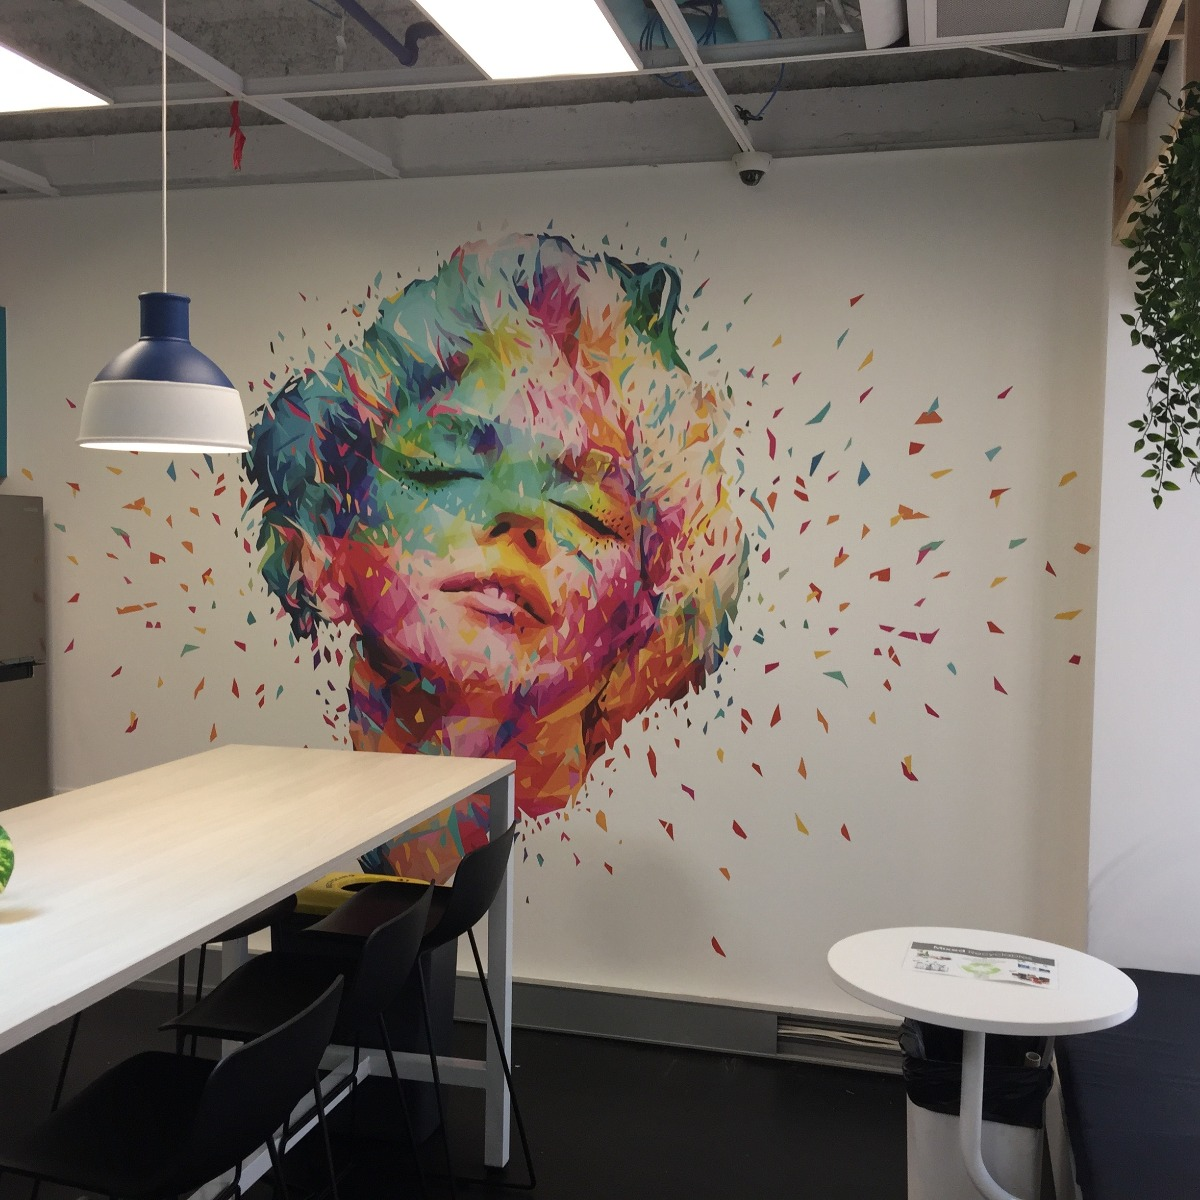 Custom Printed Wallpaper Mural for Co-Working Space